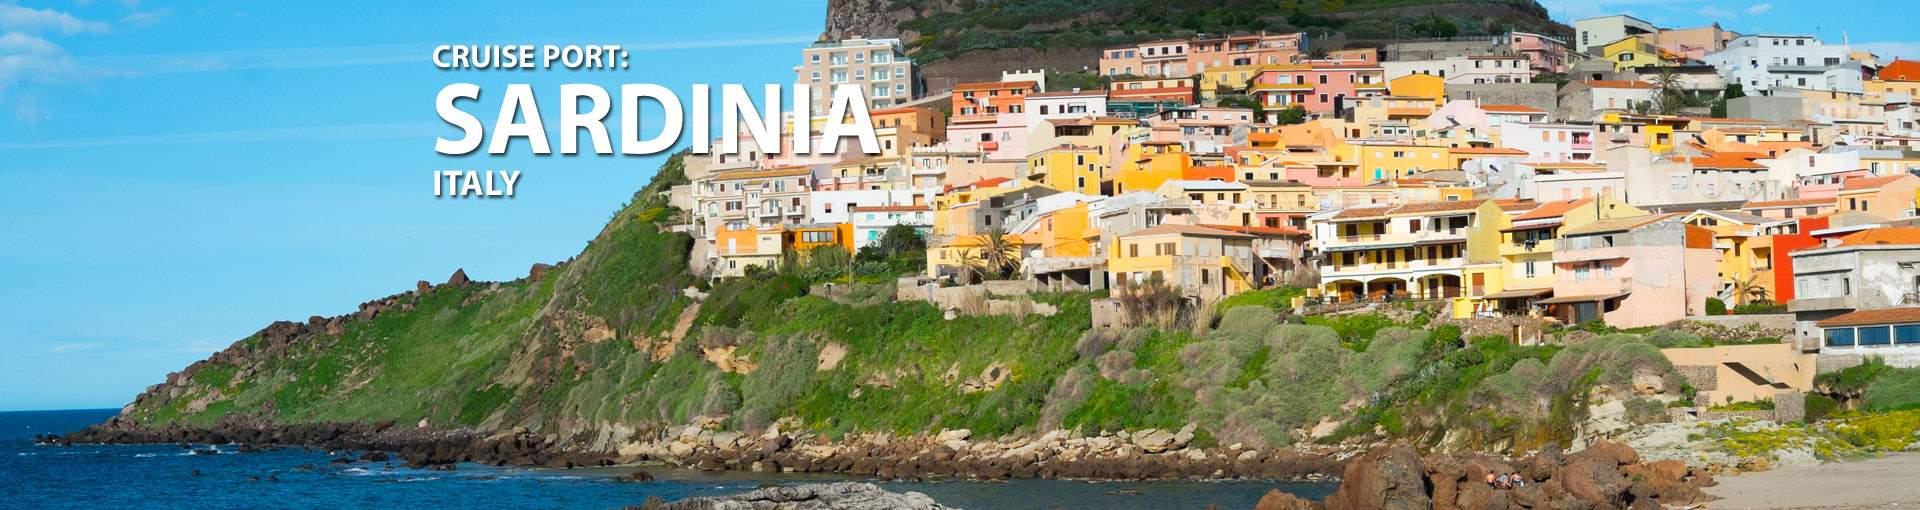 Cruises to Sardinia, Italy